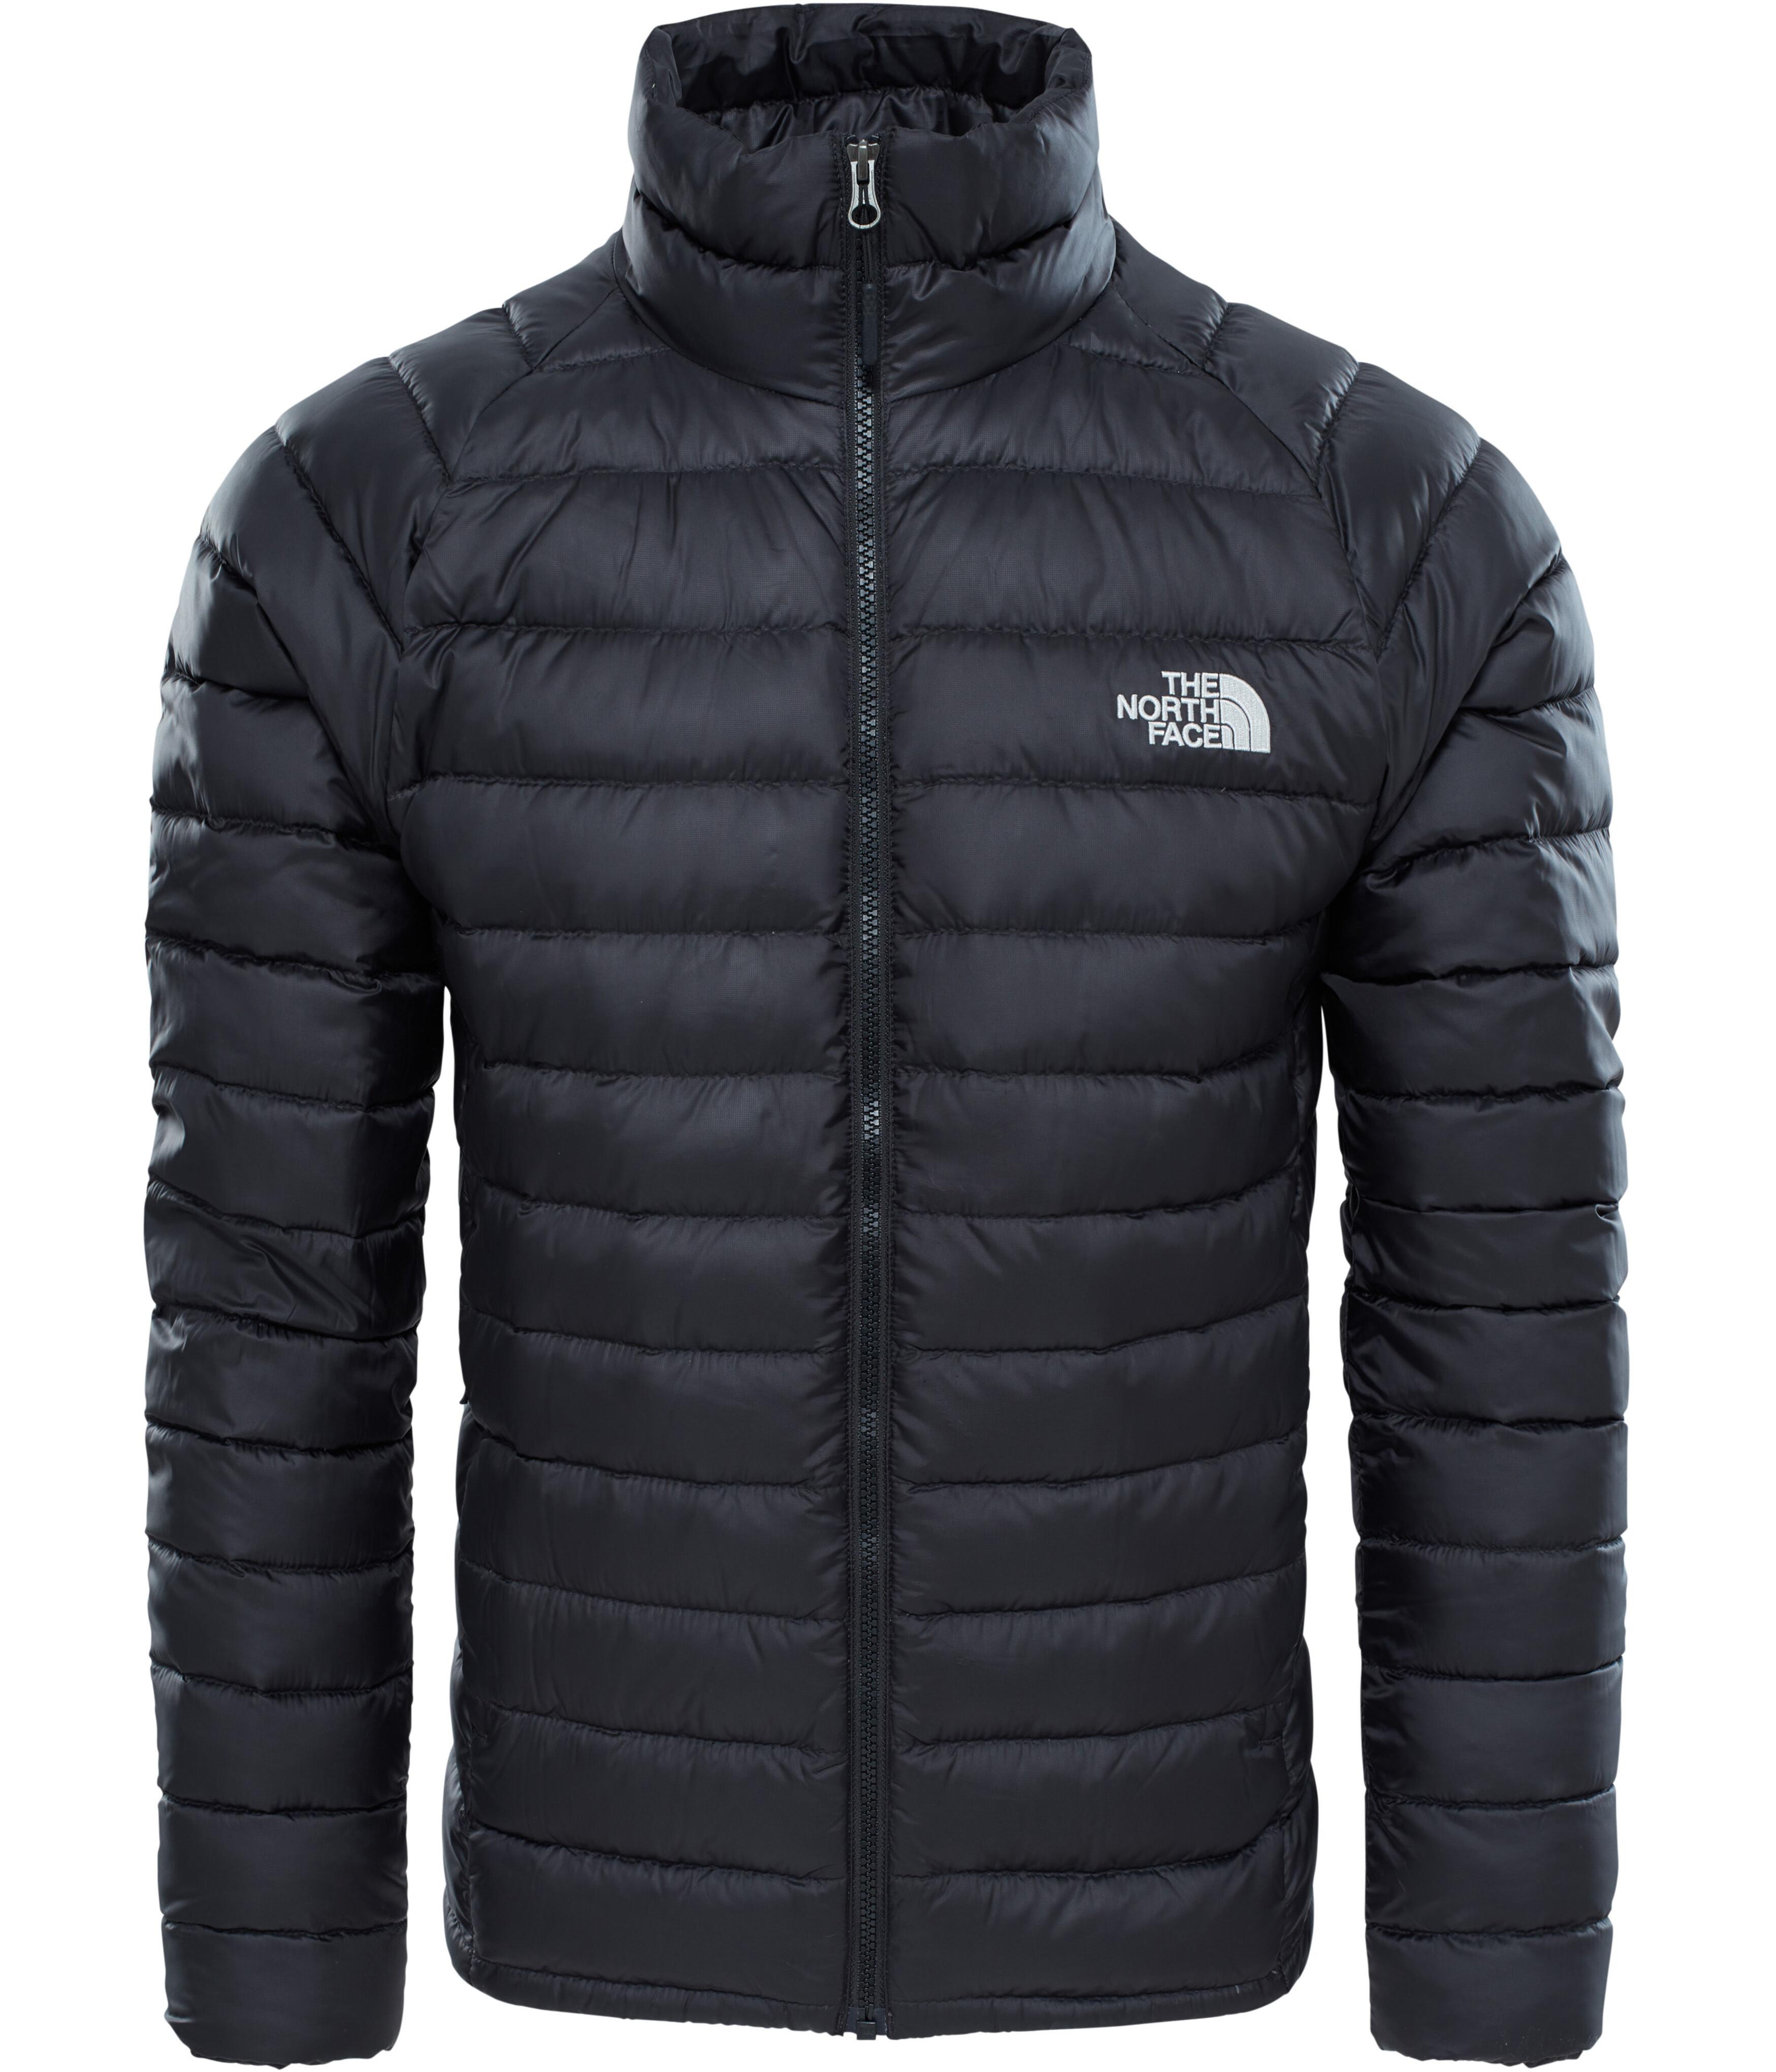 Winterjas Heren Stof.The North Face Trevail Jas Heren Black L Online Outdoor Shop Campz Nl